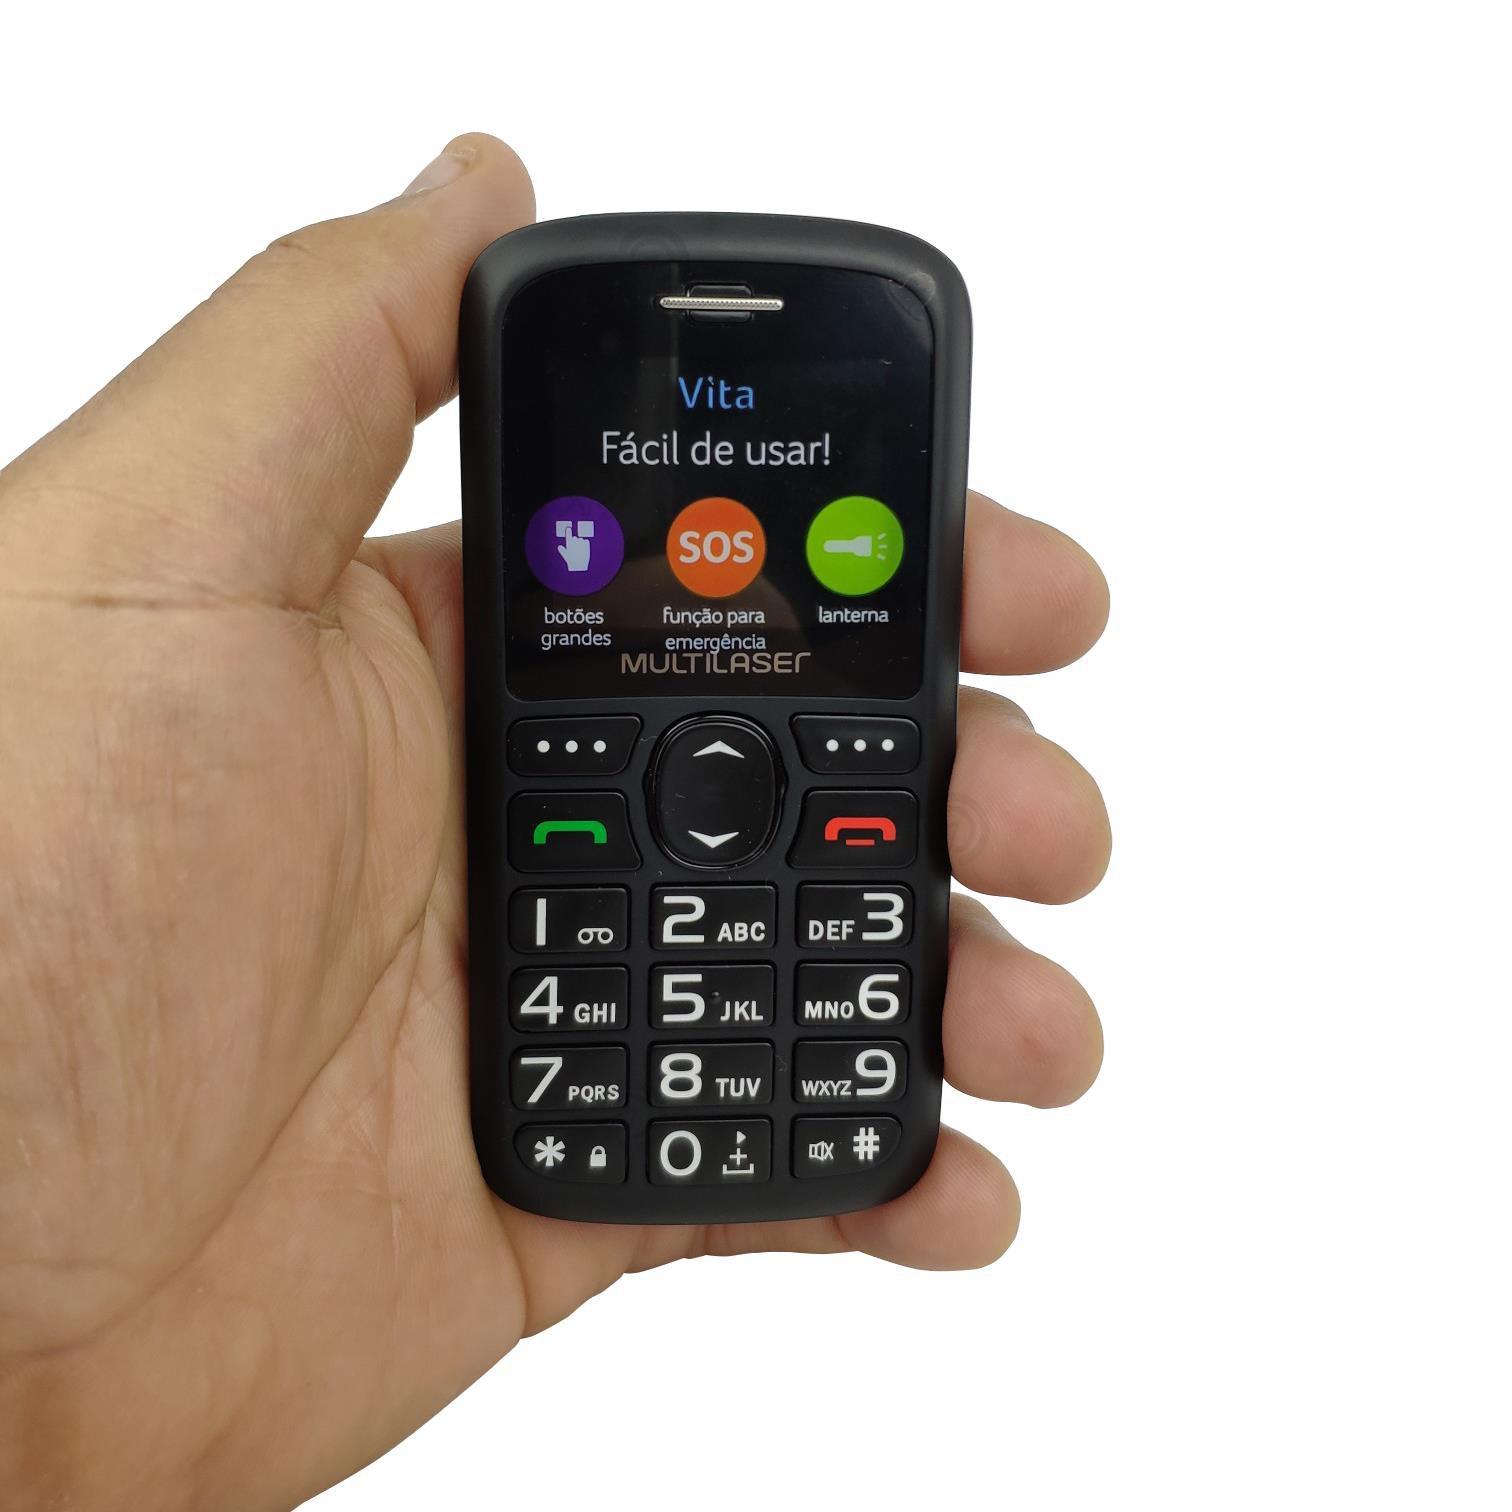 Celular Rural Multilaser Vita 3g P9091 MP3 Bluetooth Camera Tecla Grande Para Idoso com Entrada para Antena Externa,